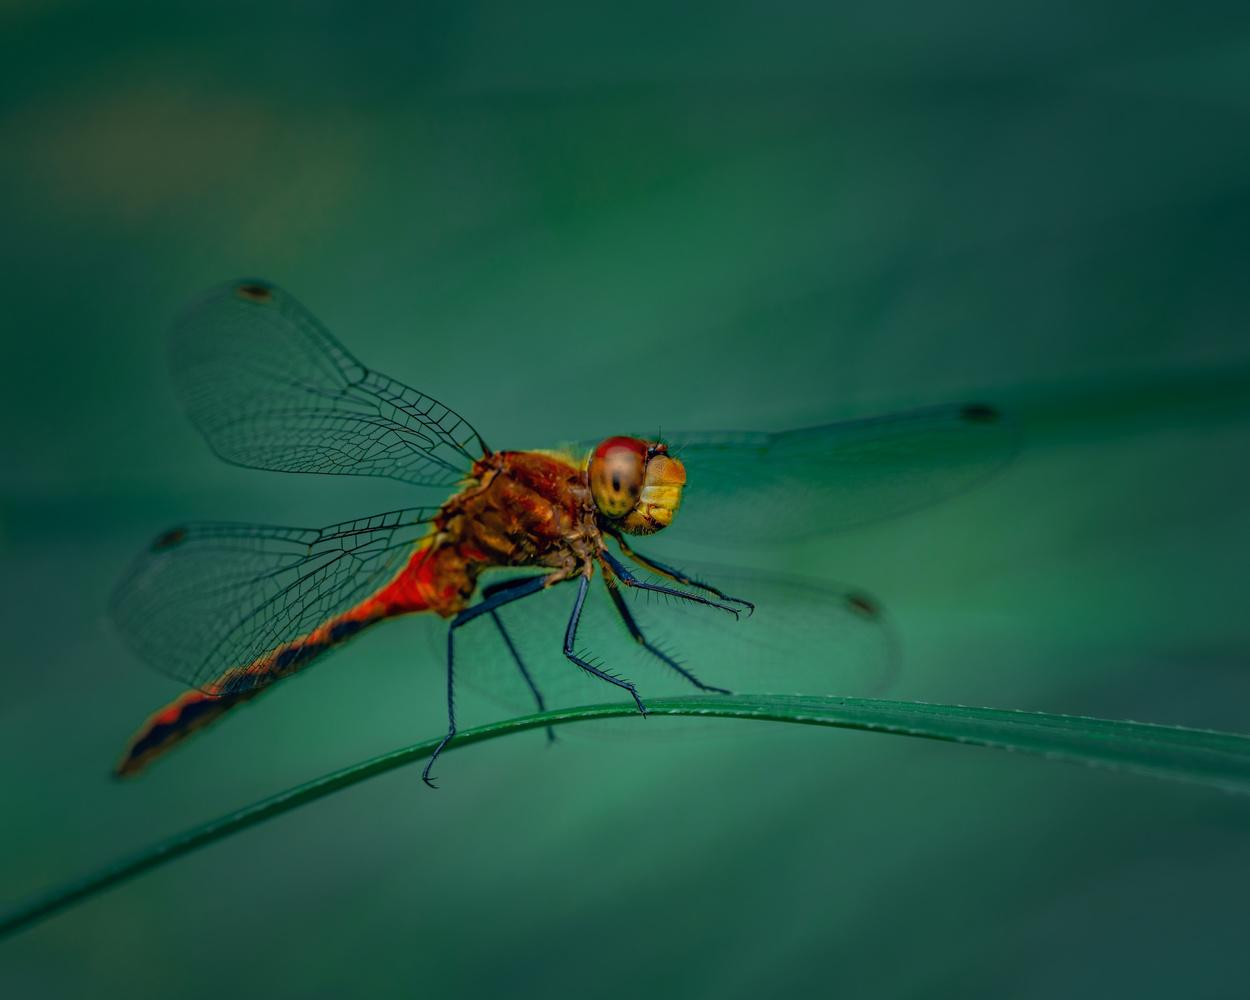 Dragonfly by Skyler Ewing